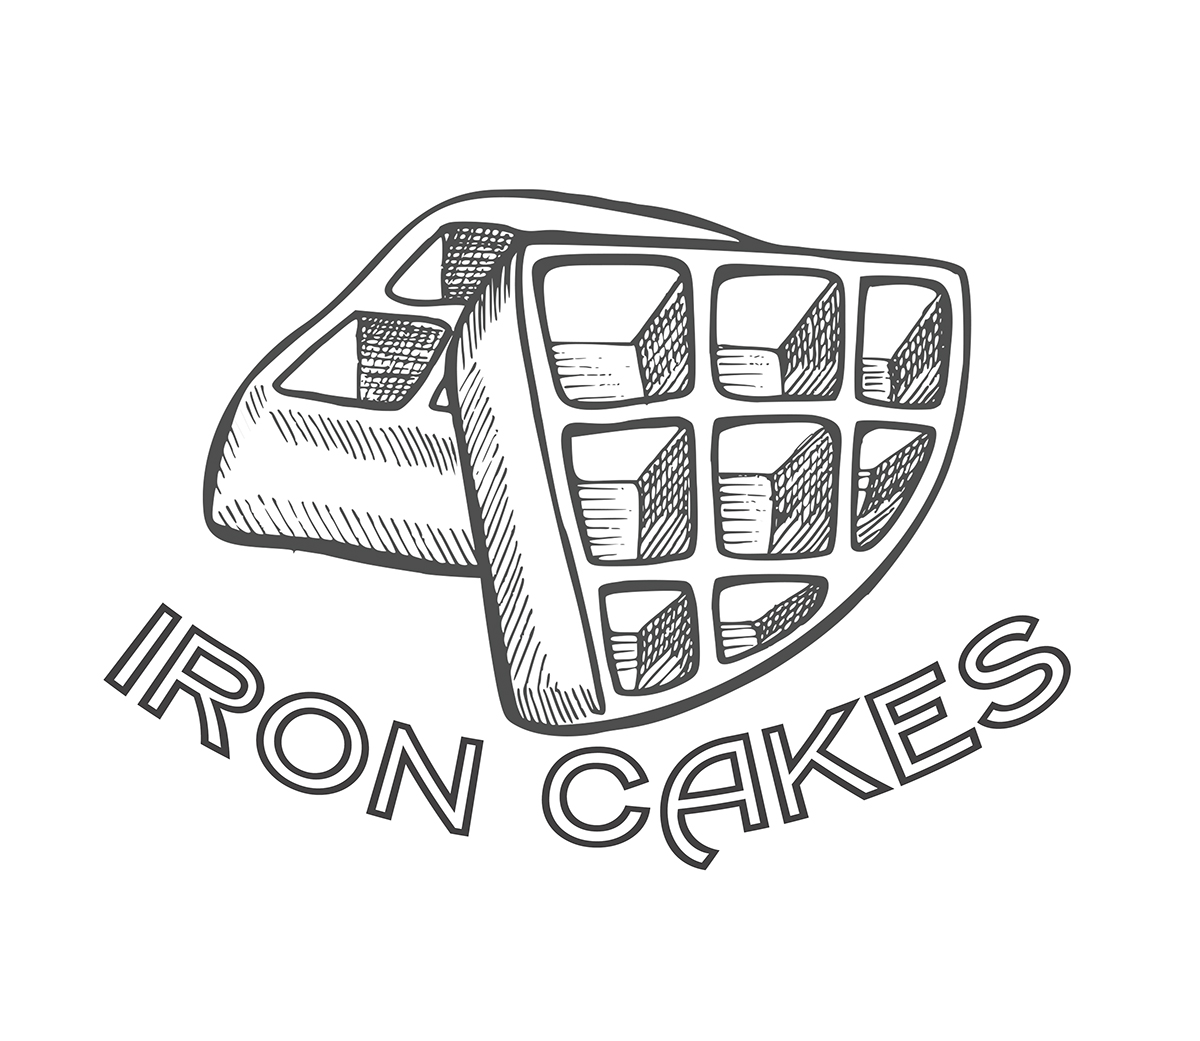 Iron-Cakes-3.jpg